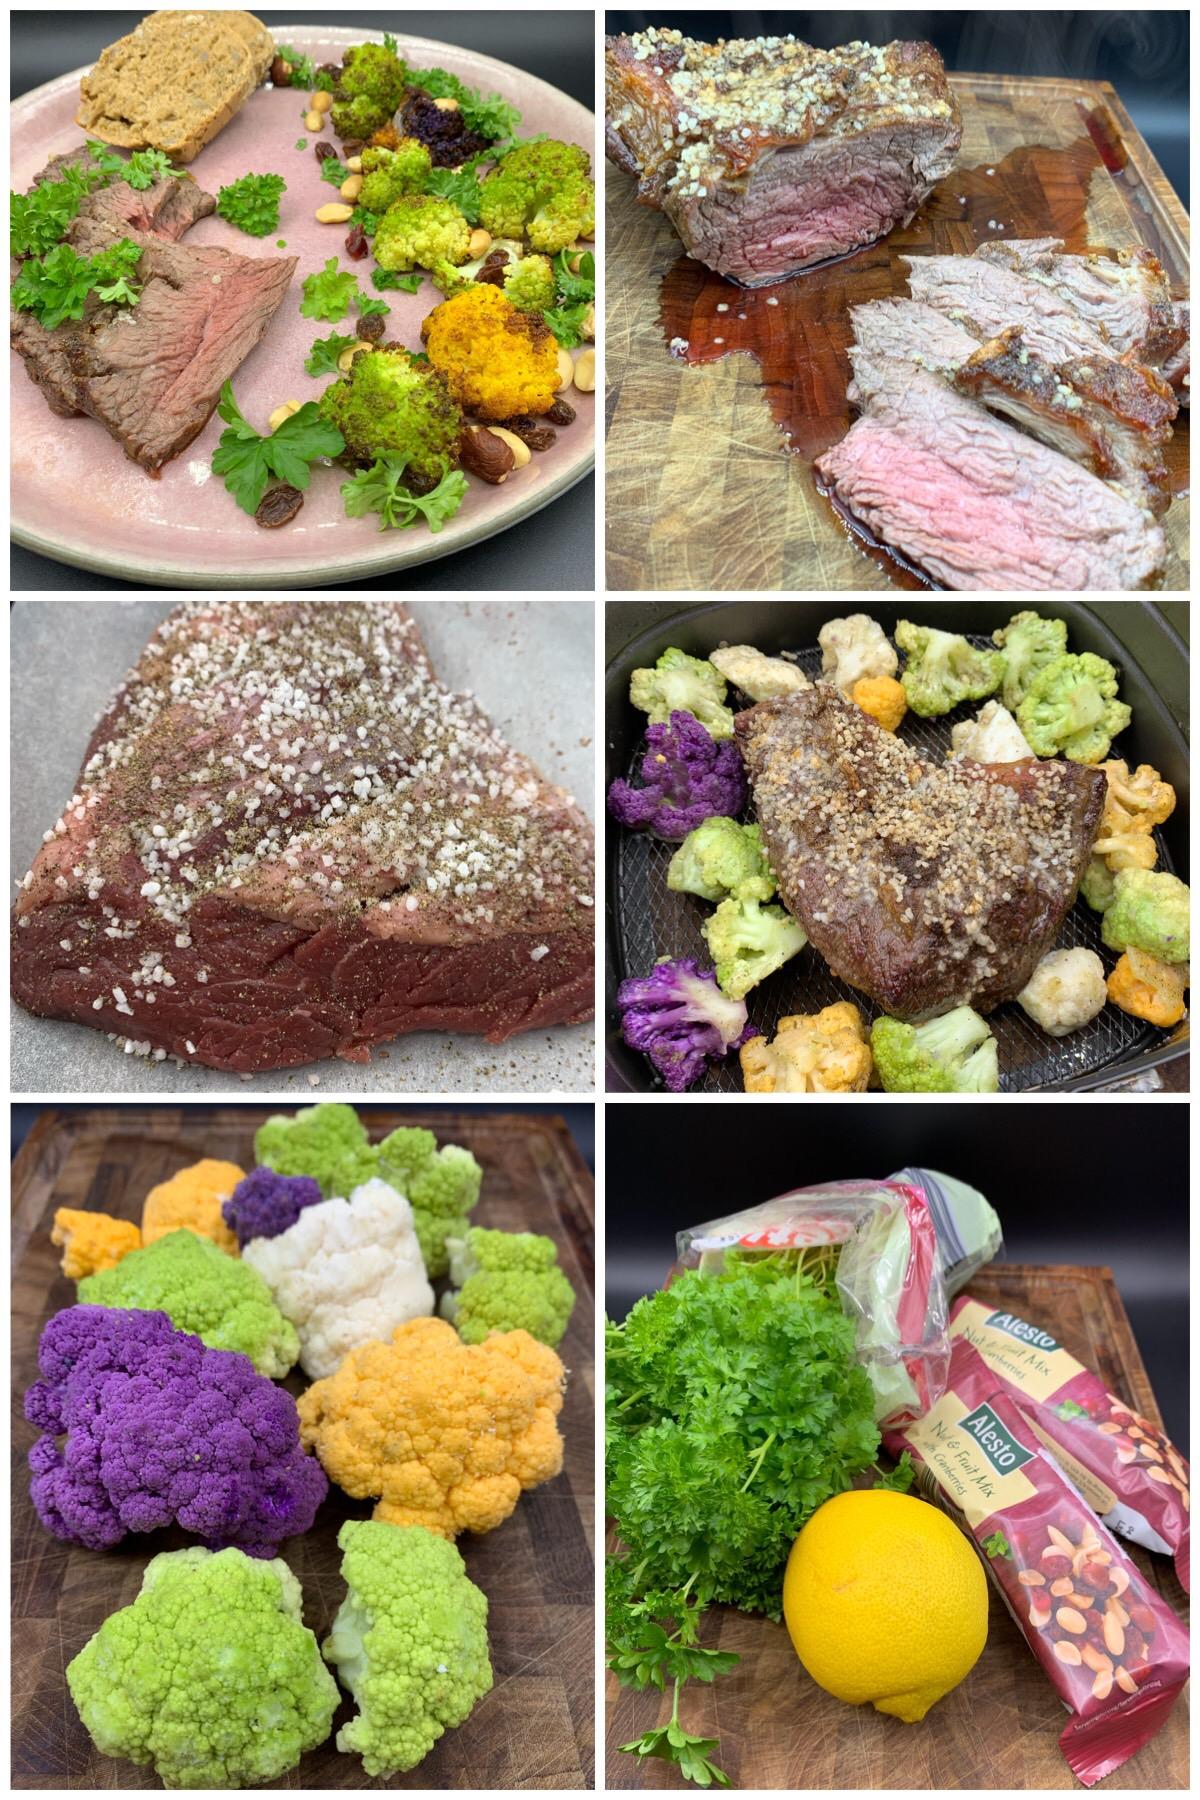 Cuvettesteg med smørbagte blomkål, persille og salatknas